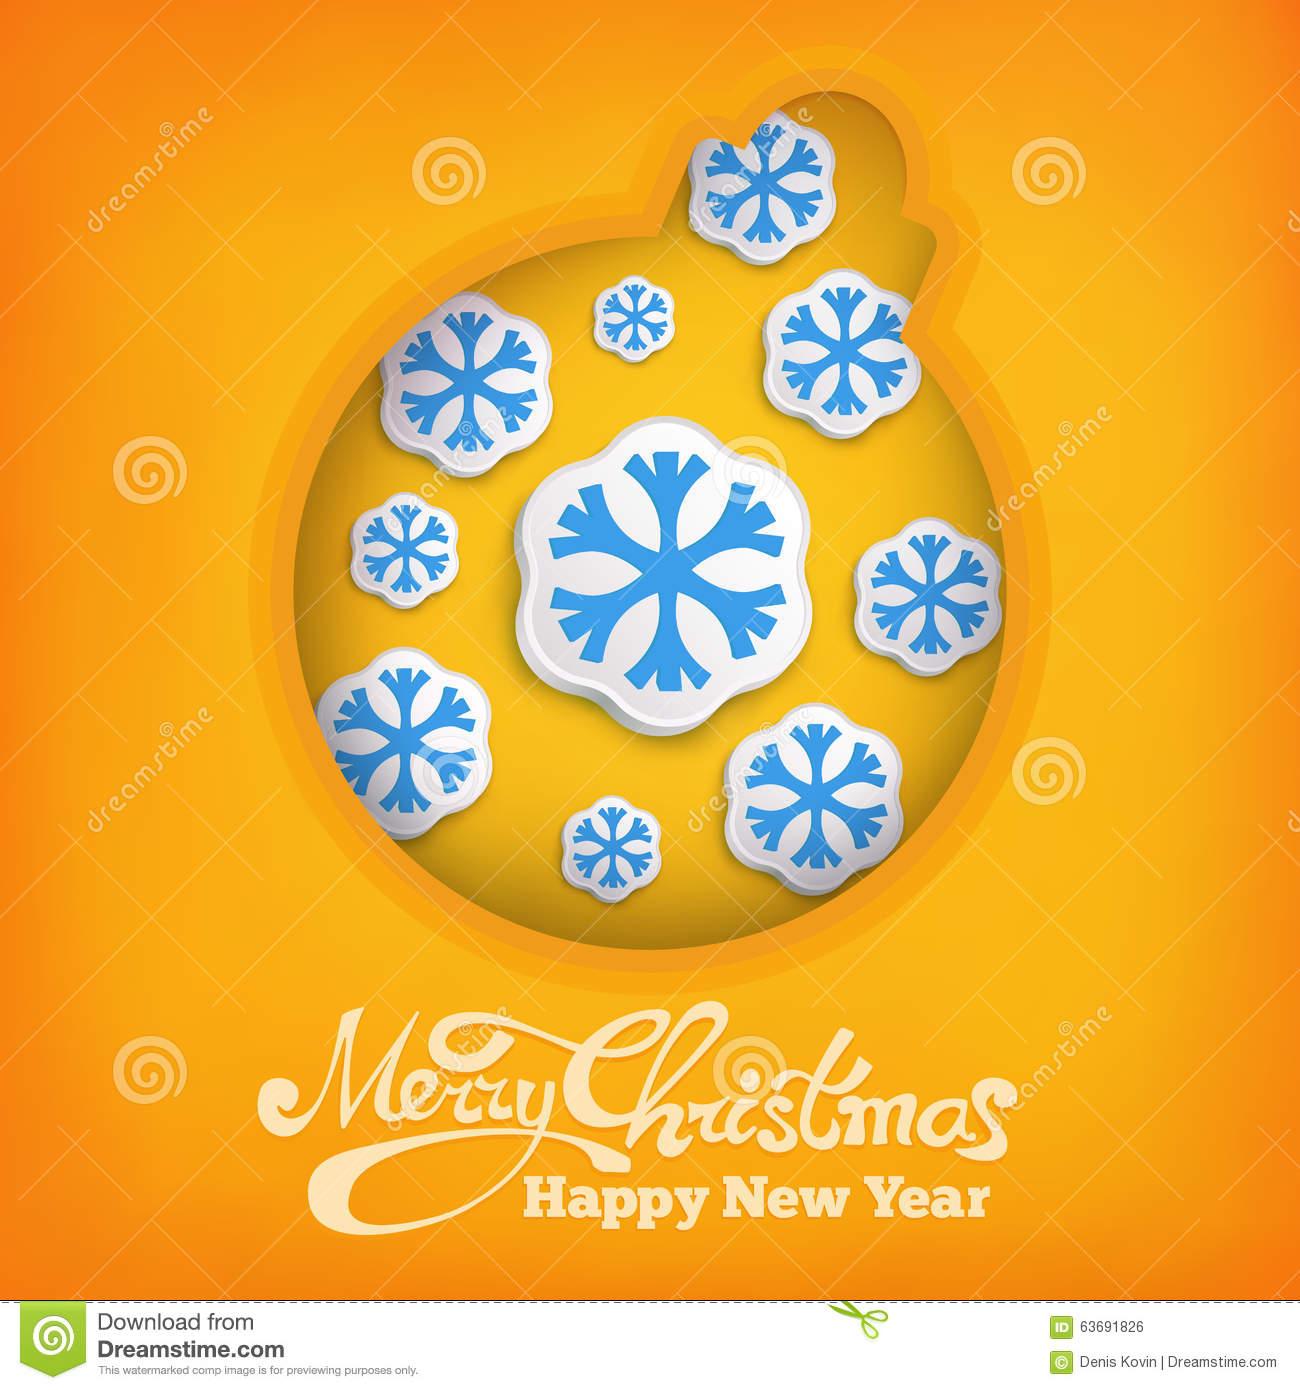 Christmas Decoration Ball Siymbol With Snowflakes On Warm Yellow.